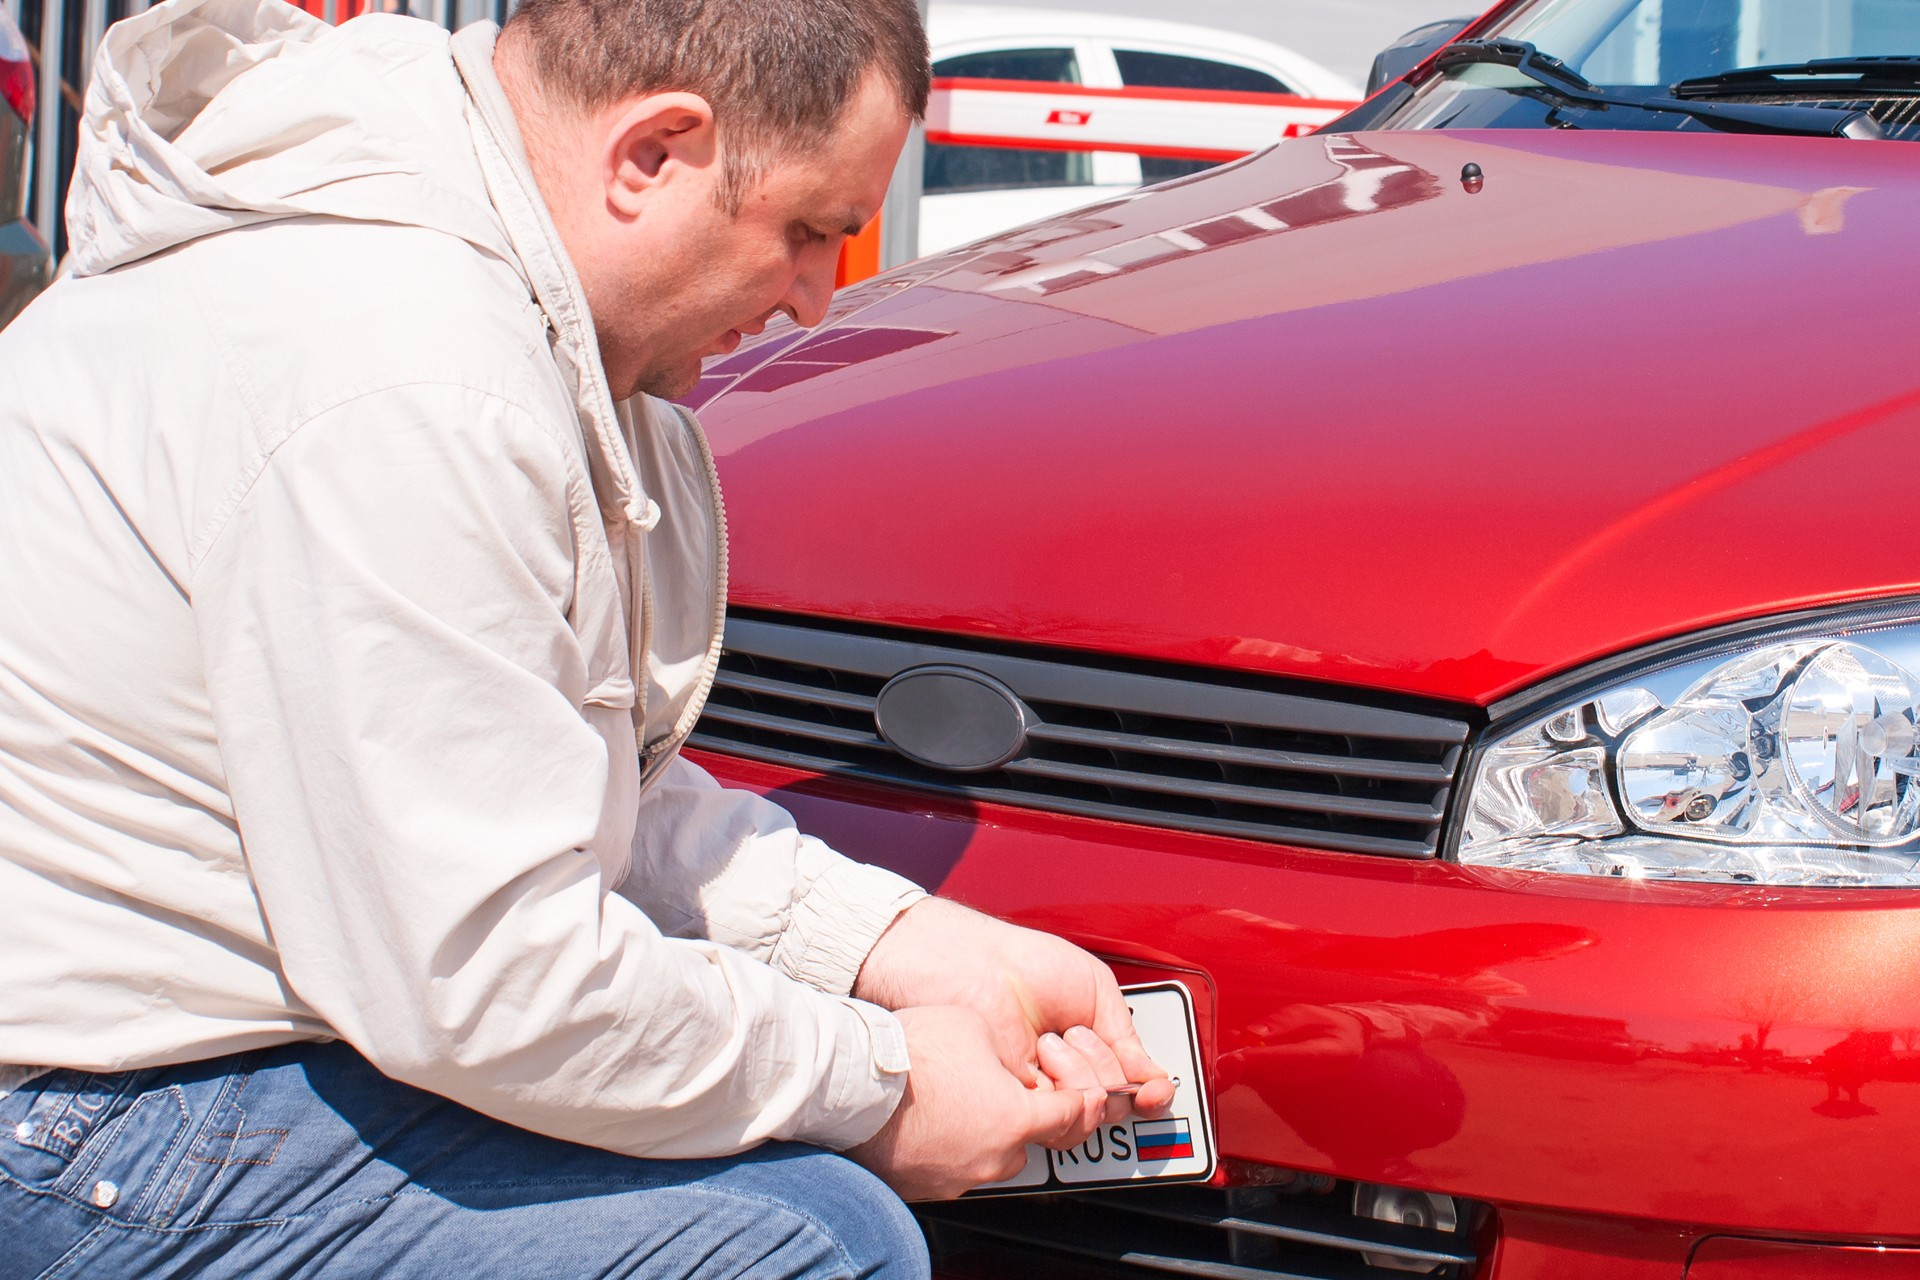 продажа незарегистрированного автомобиля